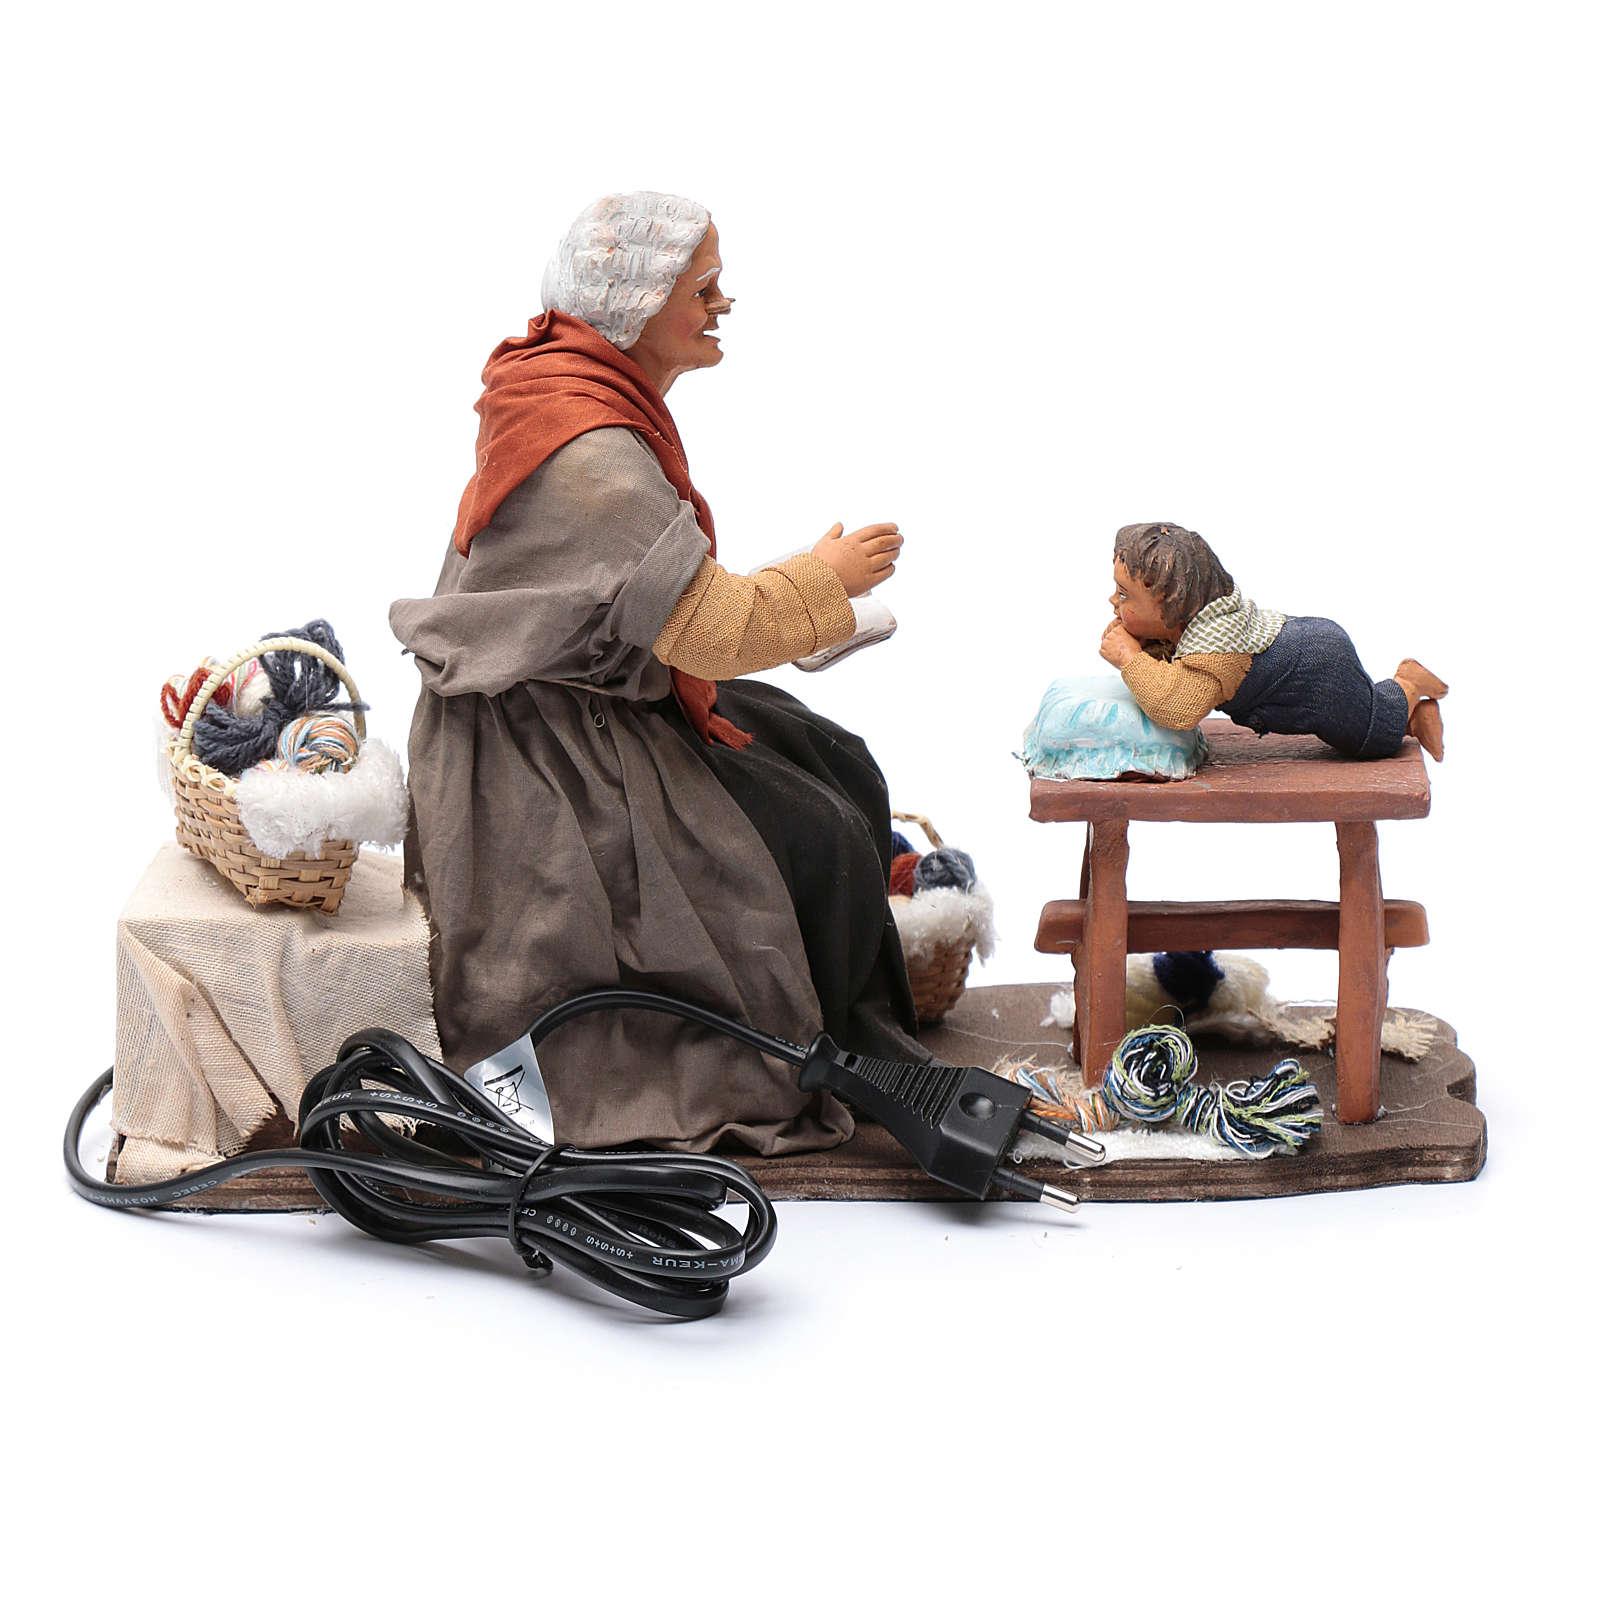 Nonna racconta storie movimento 30 cm presepe Napoli 4